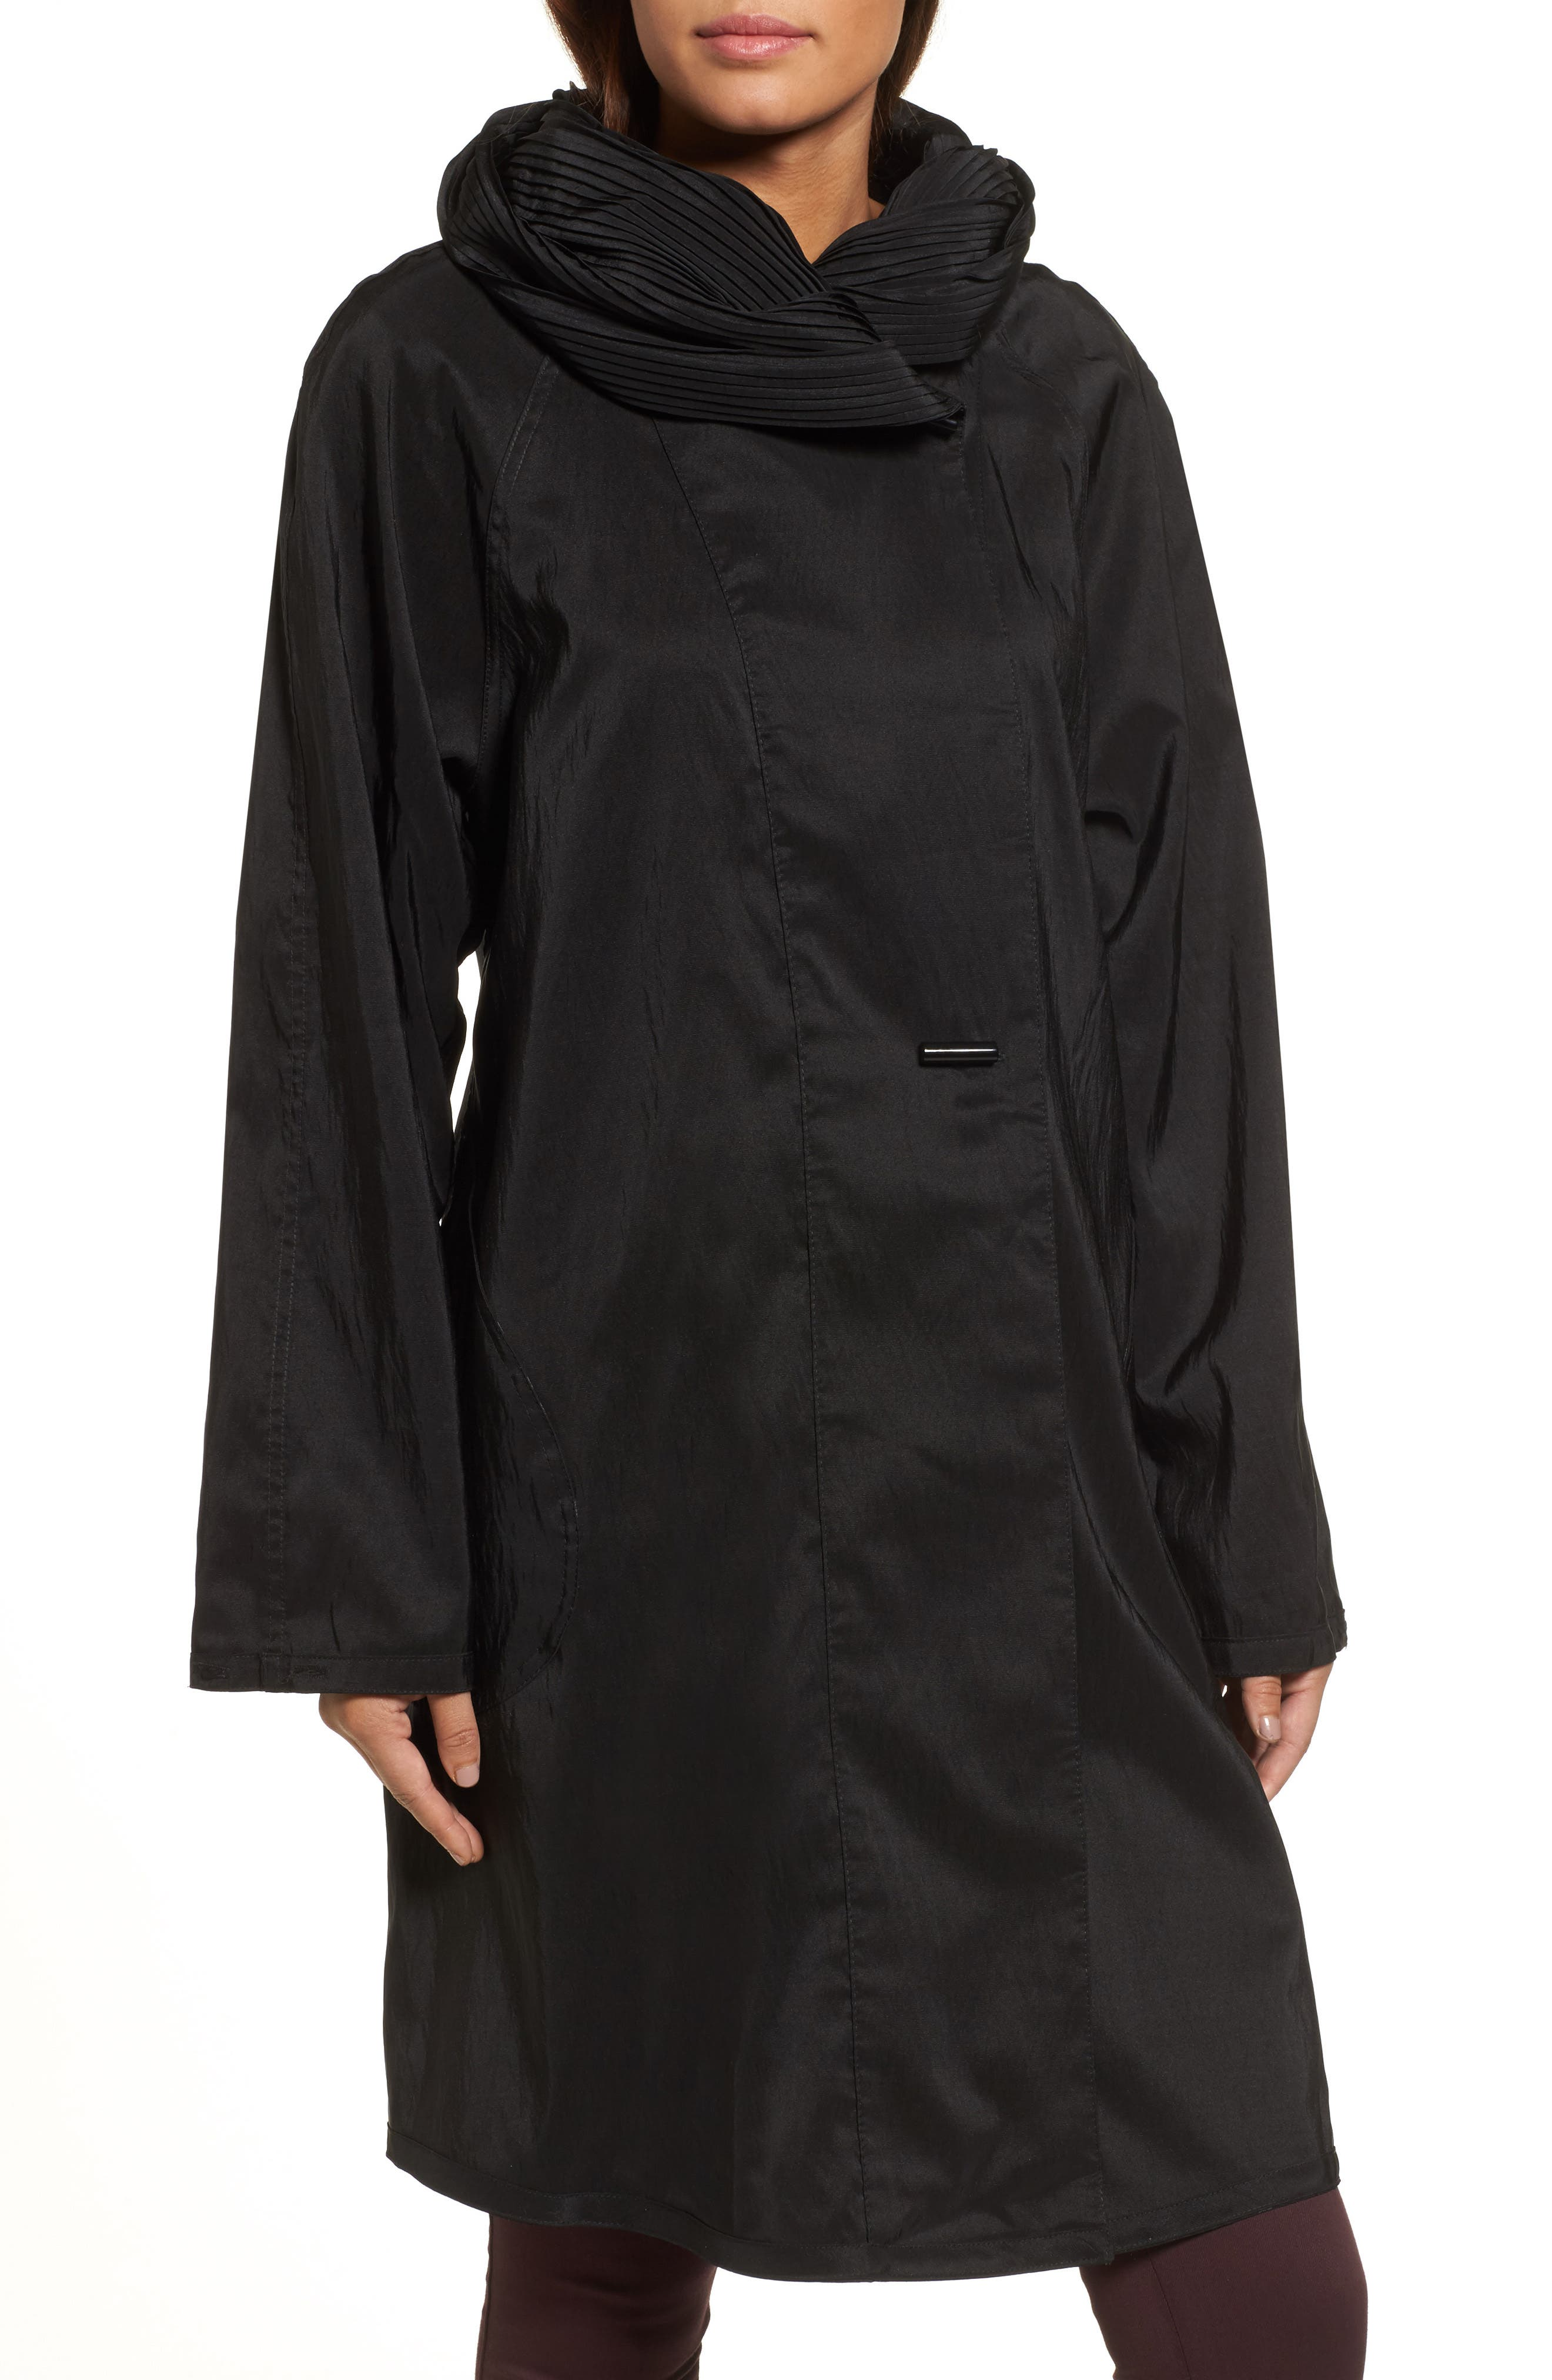 'Donatella' Reversible Dot Pleat Hood Packable Travel Coat,                             Alternate thumbnail 4, color,                             017